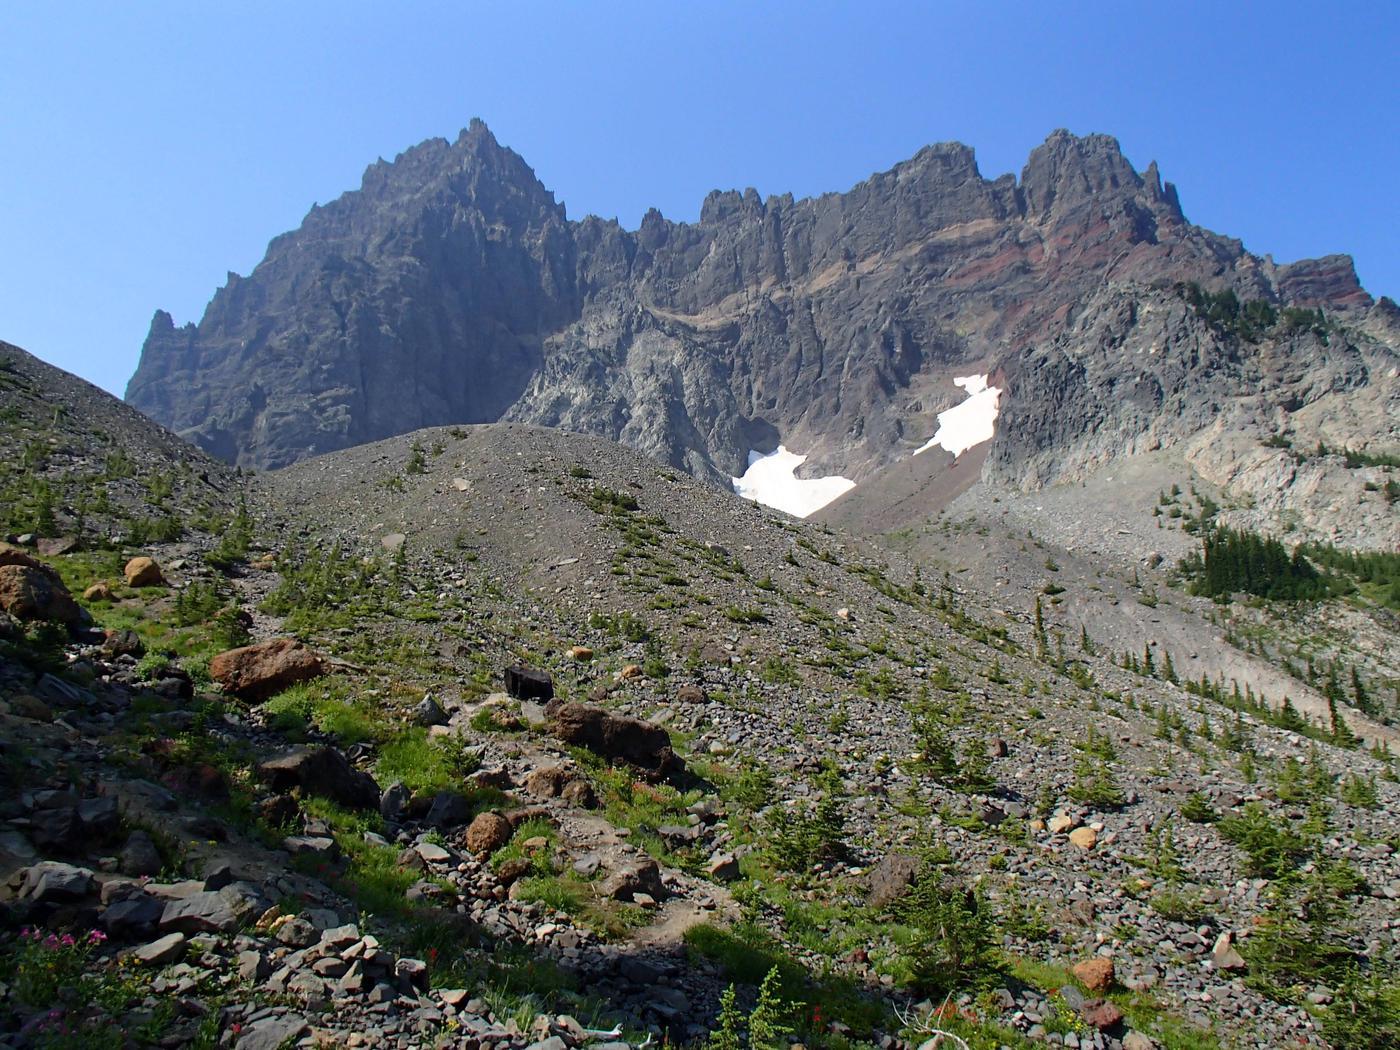 Canyon Creek Meadows, Three Finger Jack, PCT, Jack Lake, Wasco Lake, Mt Jefferson WildernessThree Finger Jack